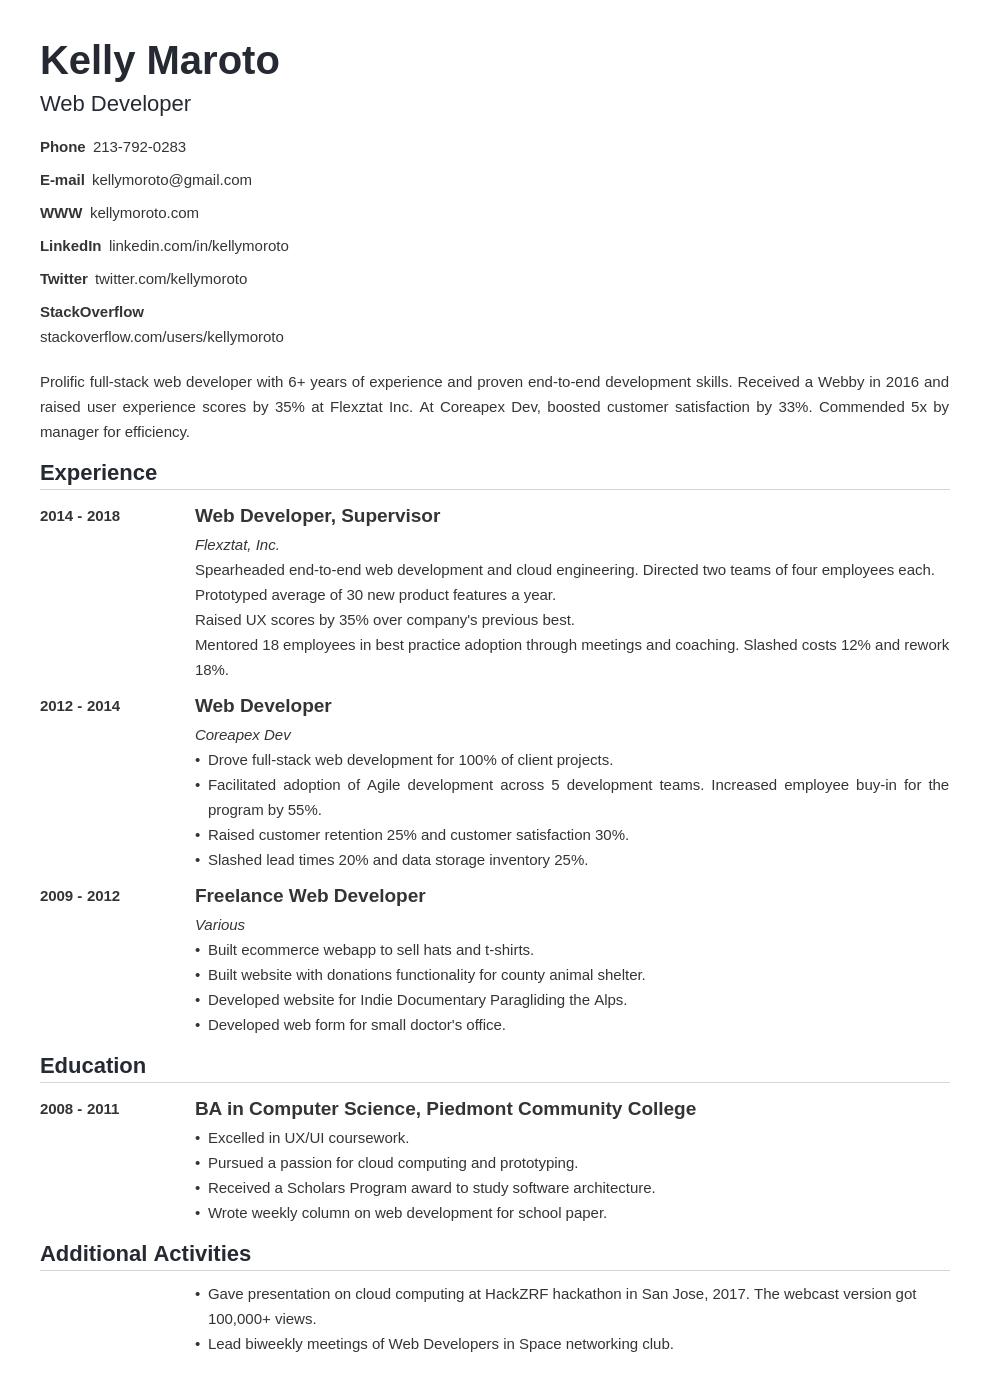 web developer template nanica uk